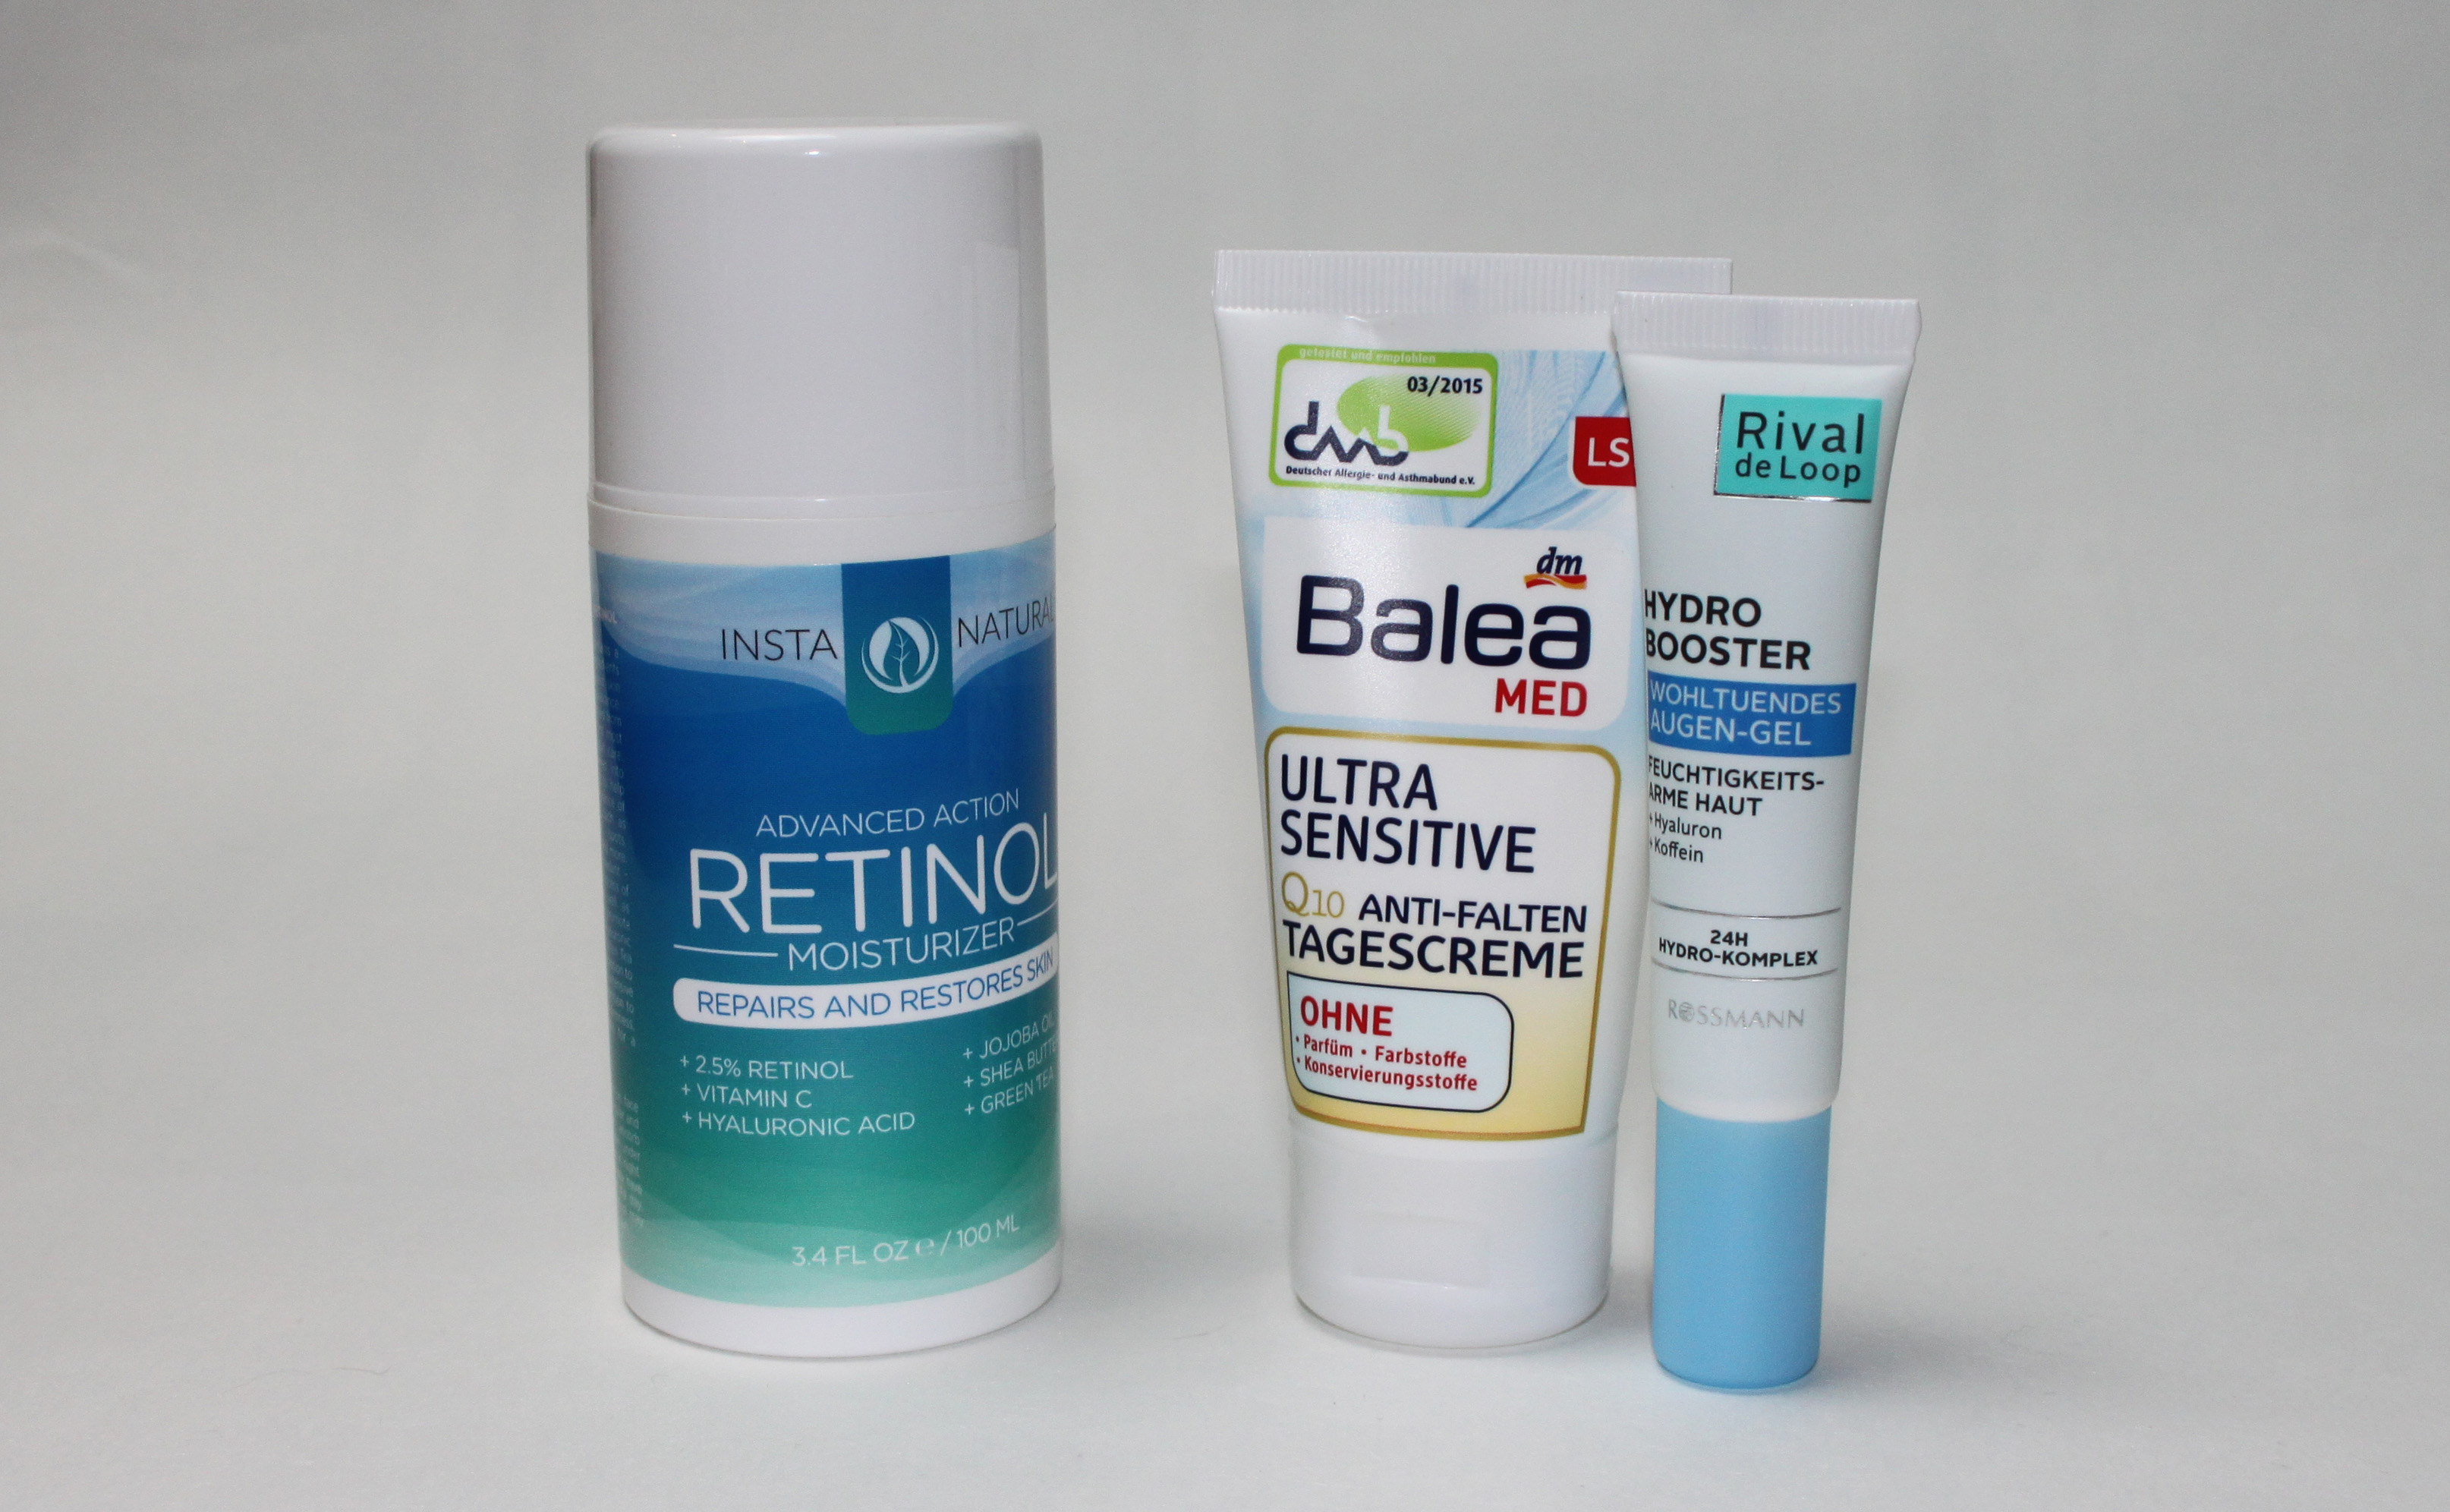 Pflegeroutine am Morgen - Insta Natural Retinol Moisturizer, Balea Ultra Sensistive Creme, RdL Hydro Booster